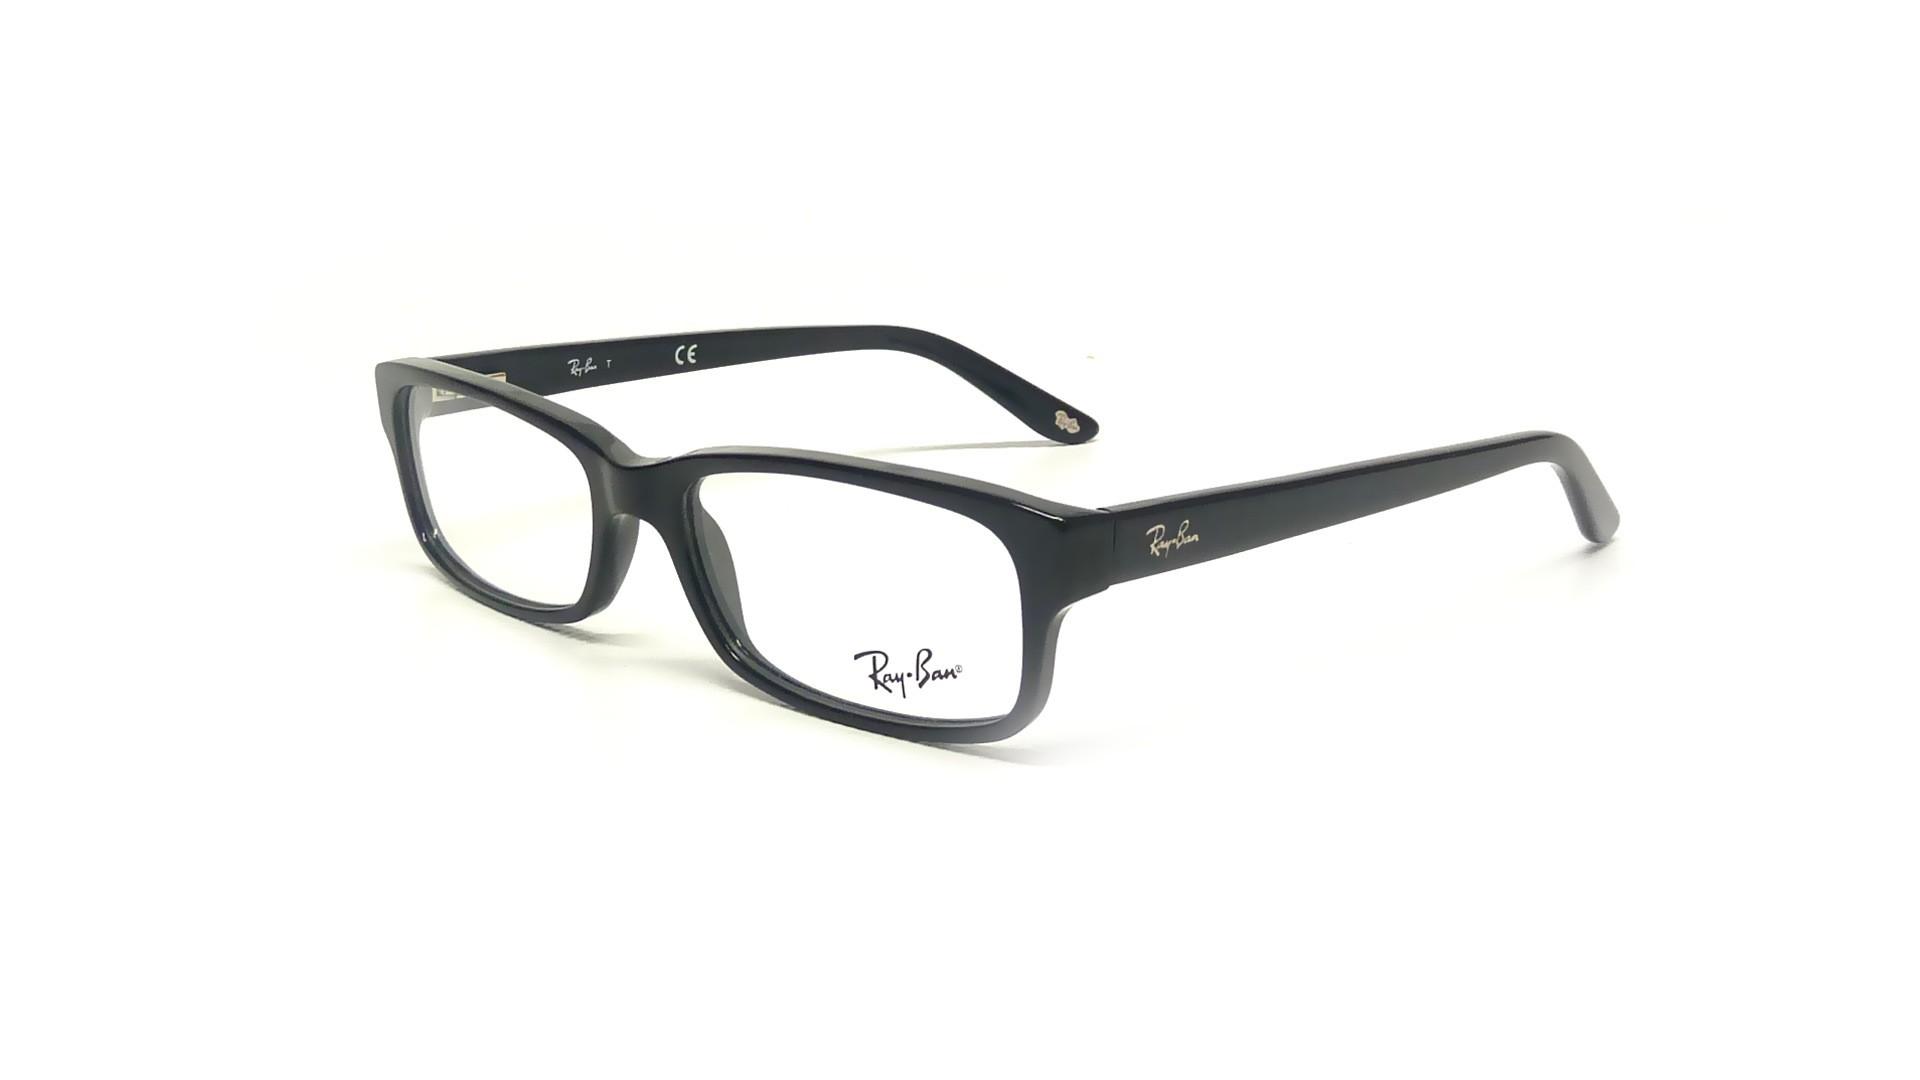 4d49f348ef2 Ray Ban RB 5187 2000 Black Frames Eyeglasses 50mm - 107